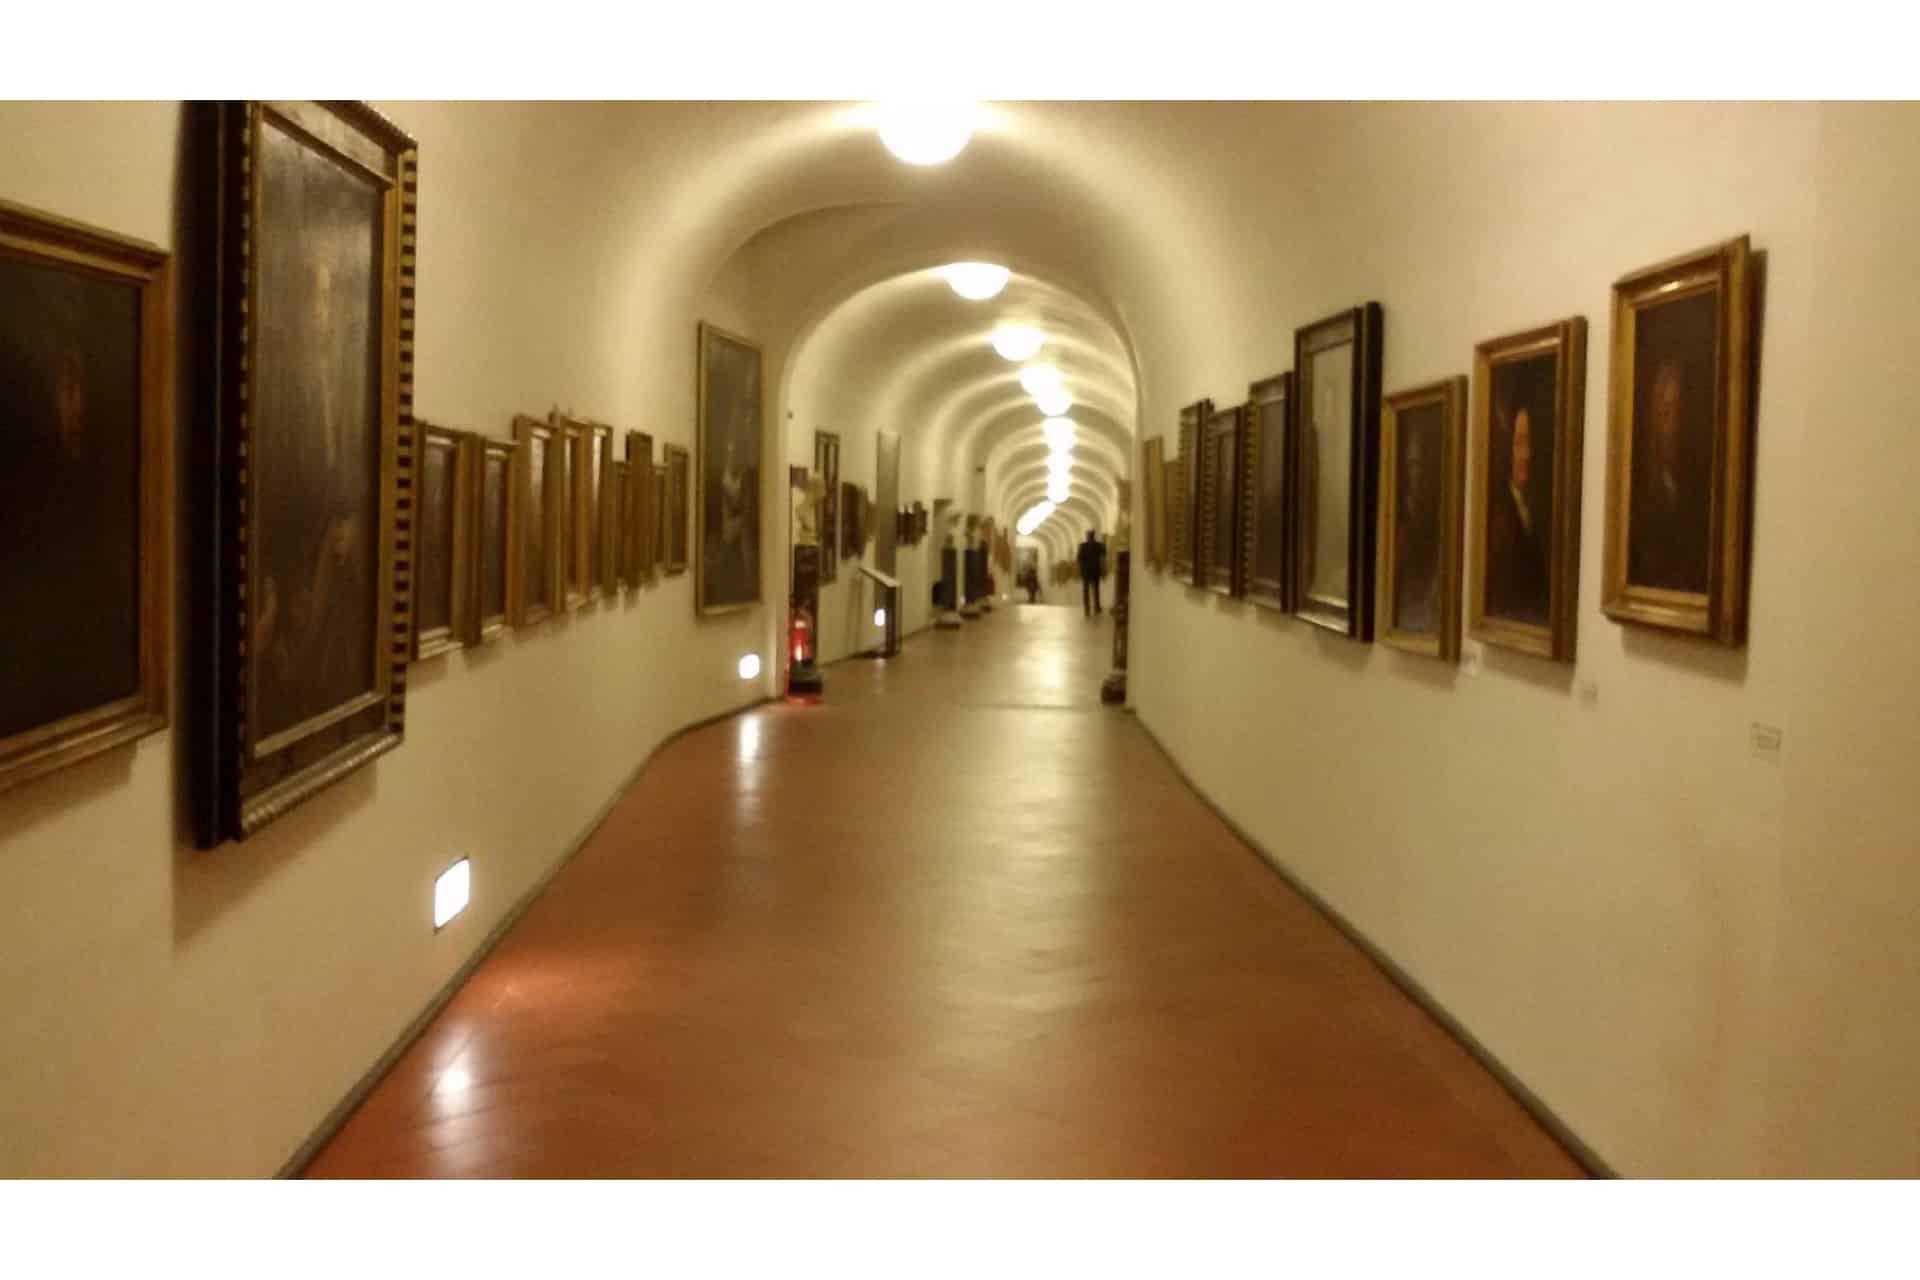 interno del corridoio vasariano